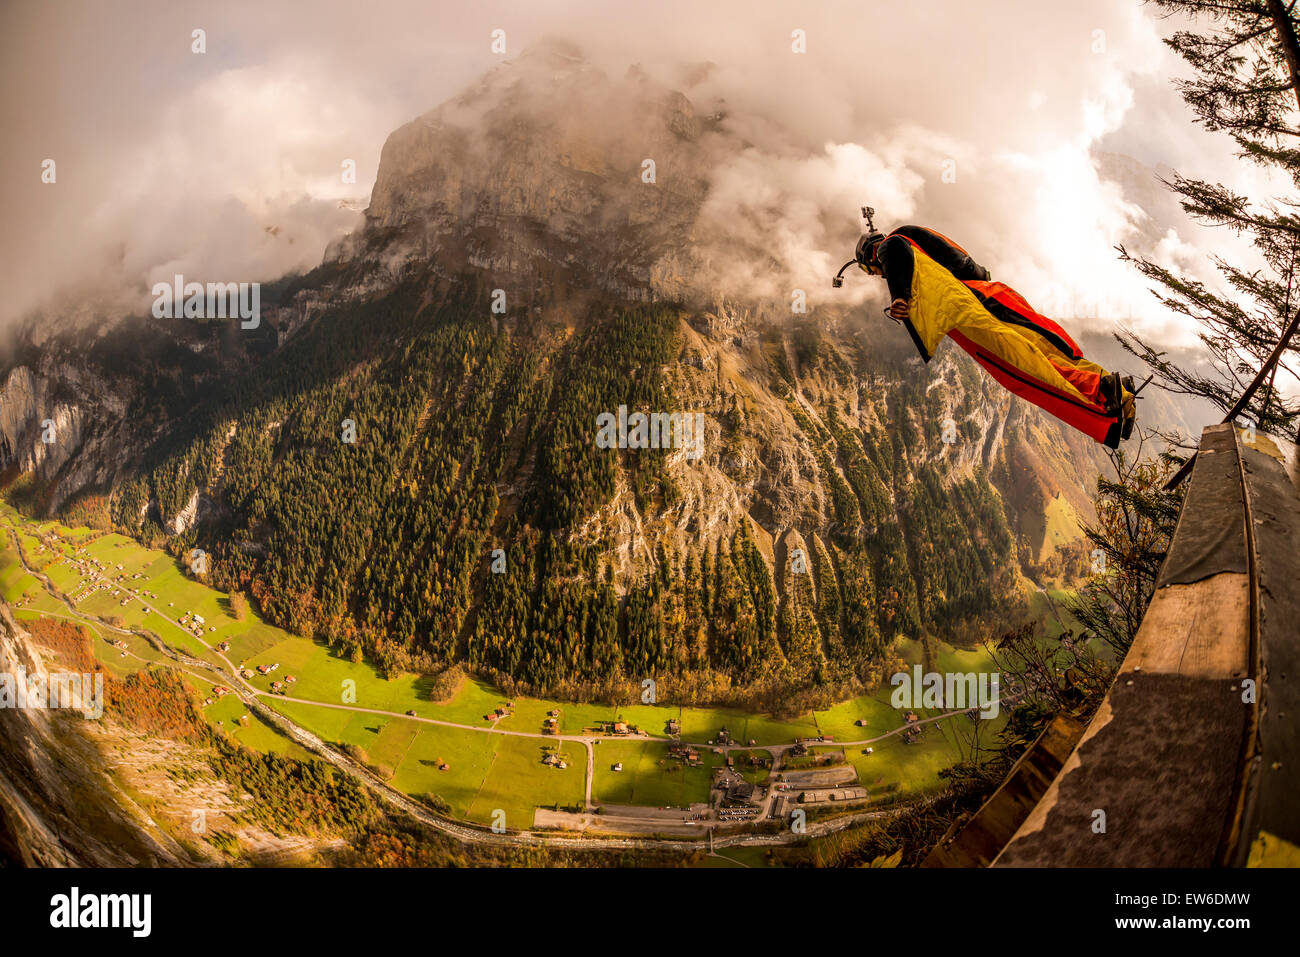 A base jumper leaping off a platform to the valley below.    Murren, Lauterbrunnen, Switzerland - Stock Image